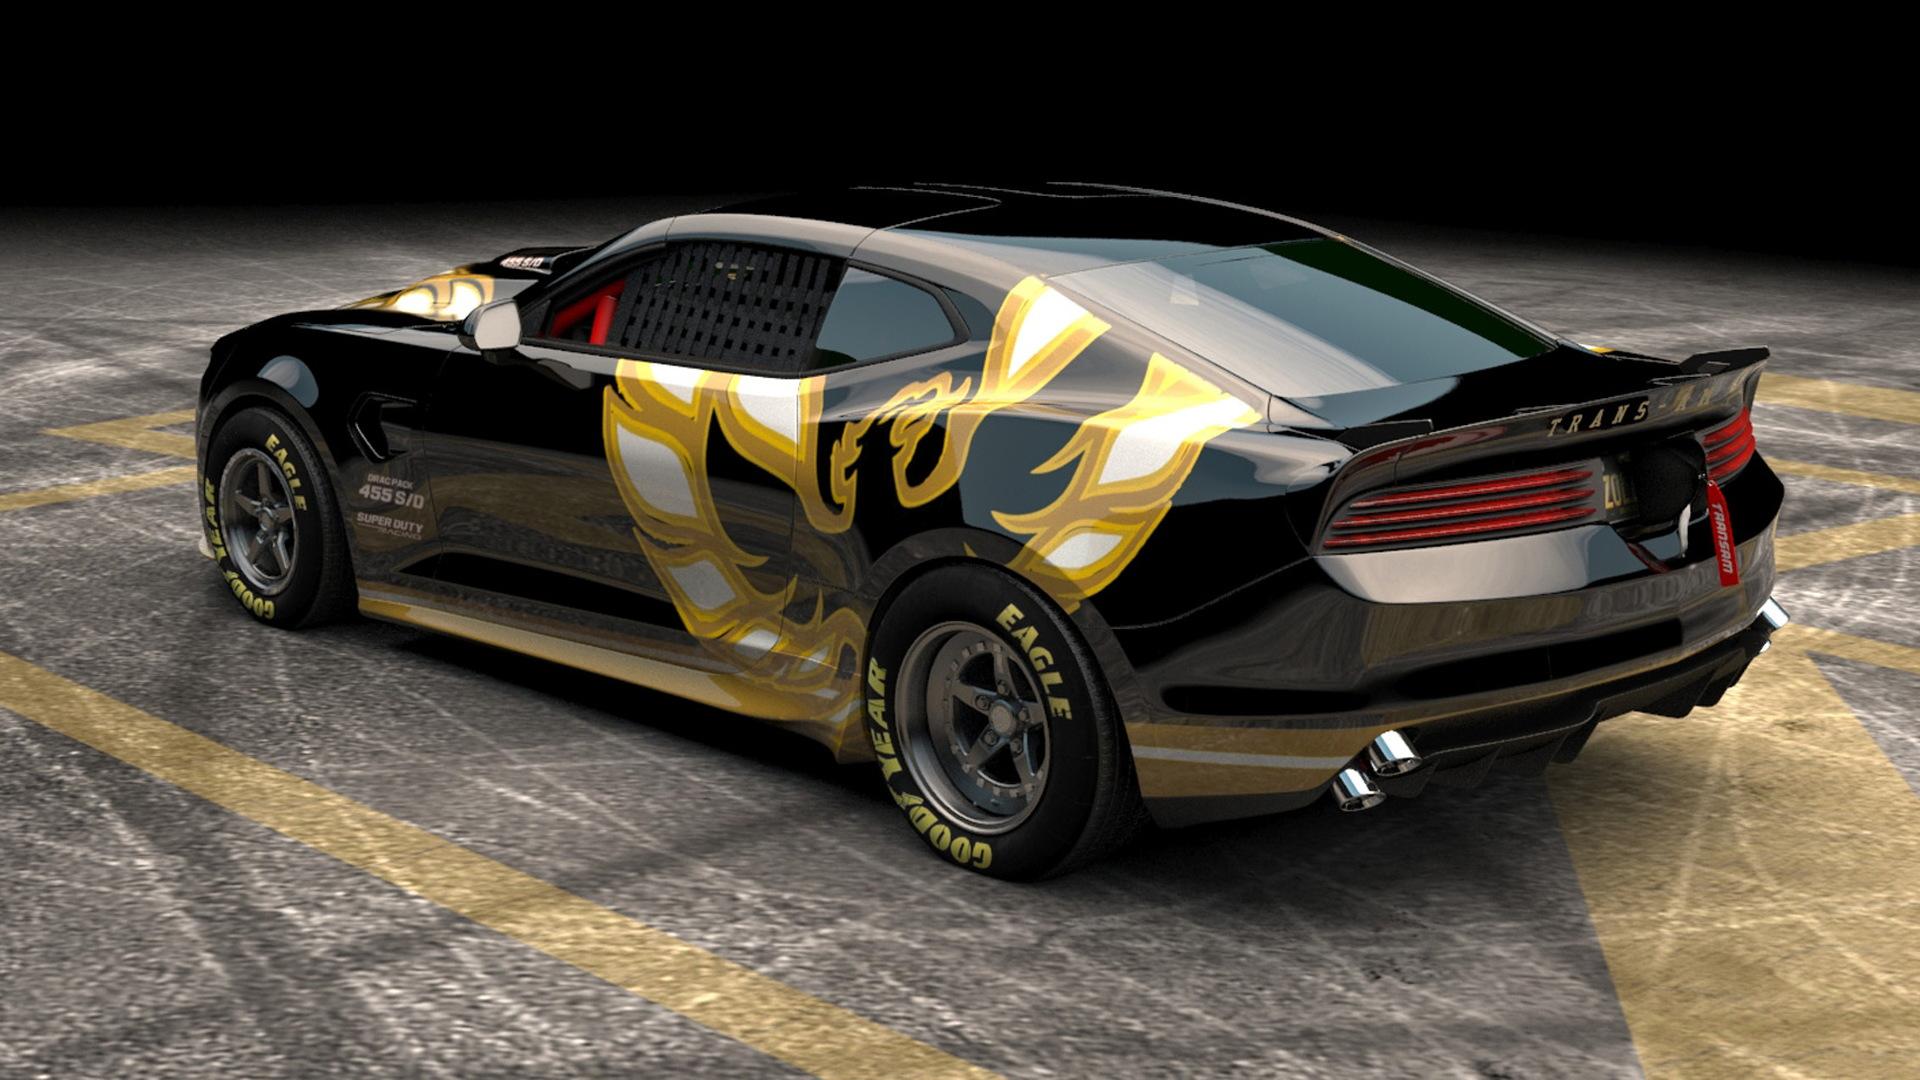 New Trans Am >> Trans Am Depot Makes 455 Super Duty Drag Car With 1 100 Horsepower